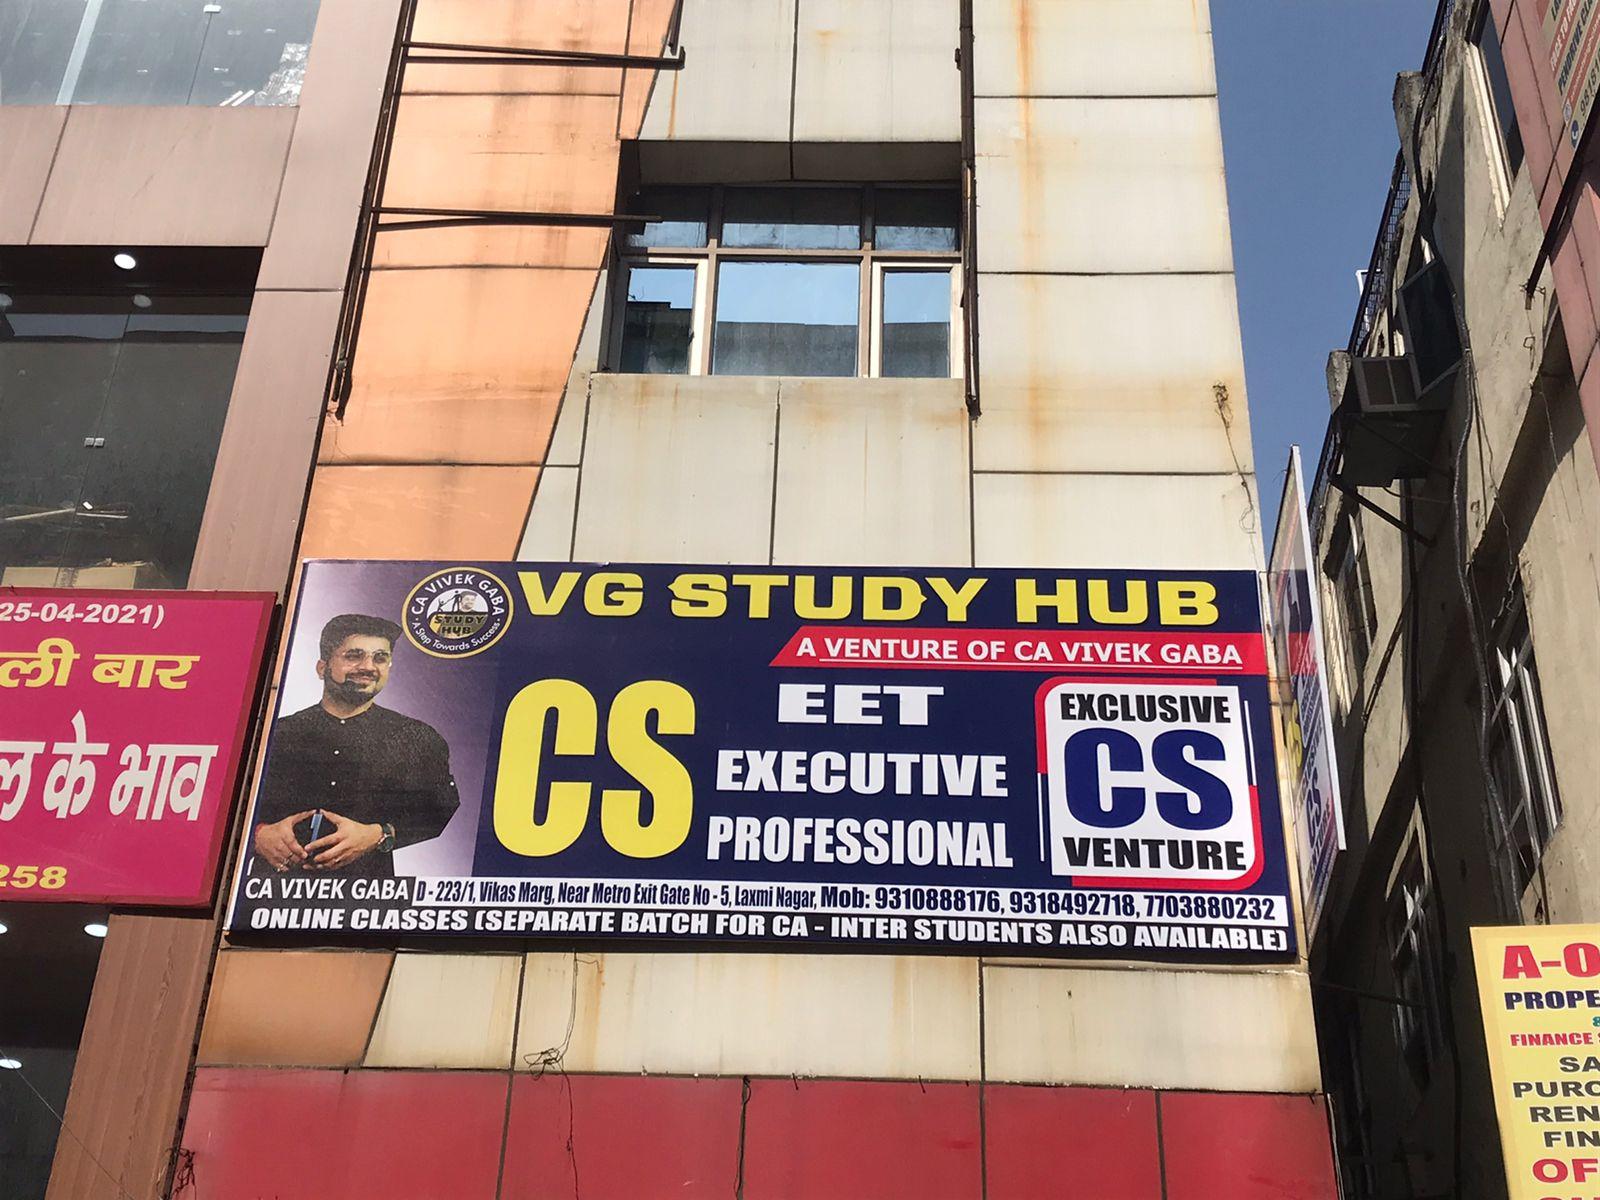 VG STUDY HUB Logo